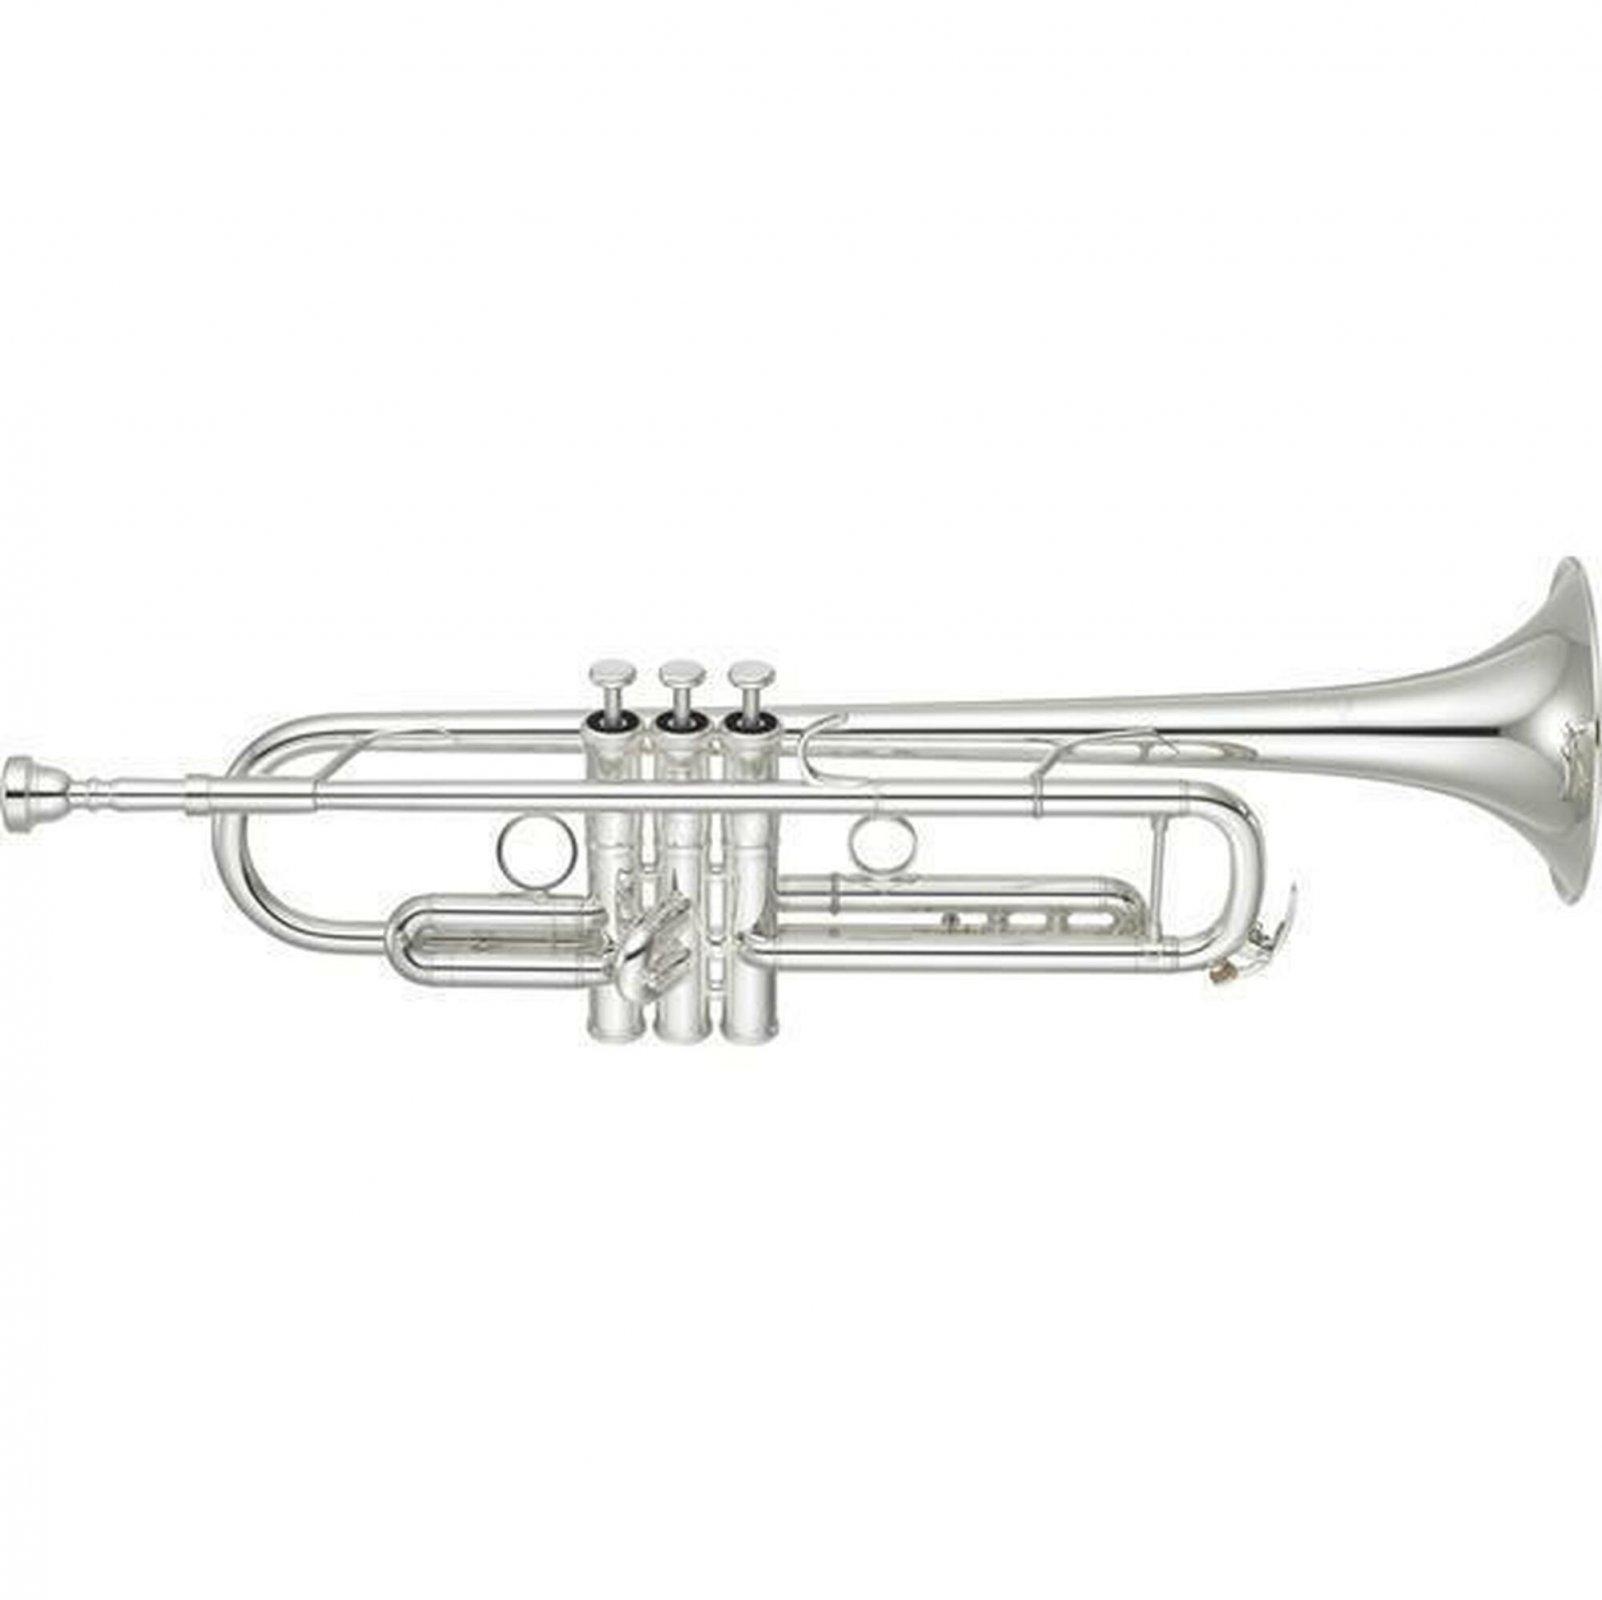 Yamaha YTR-8335IIRS Custom Xeno Trumpet; Silverplated